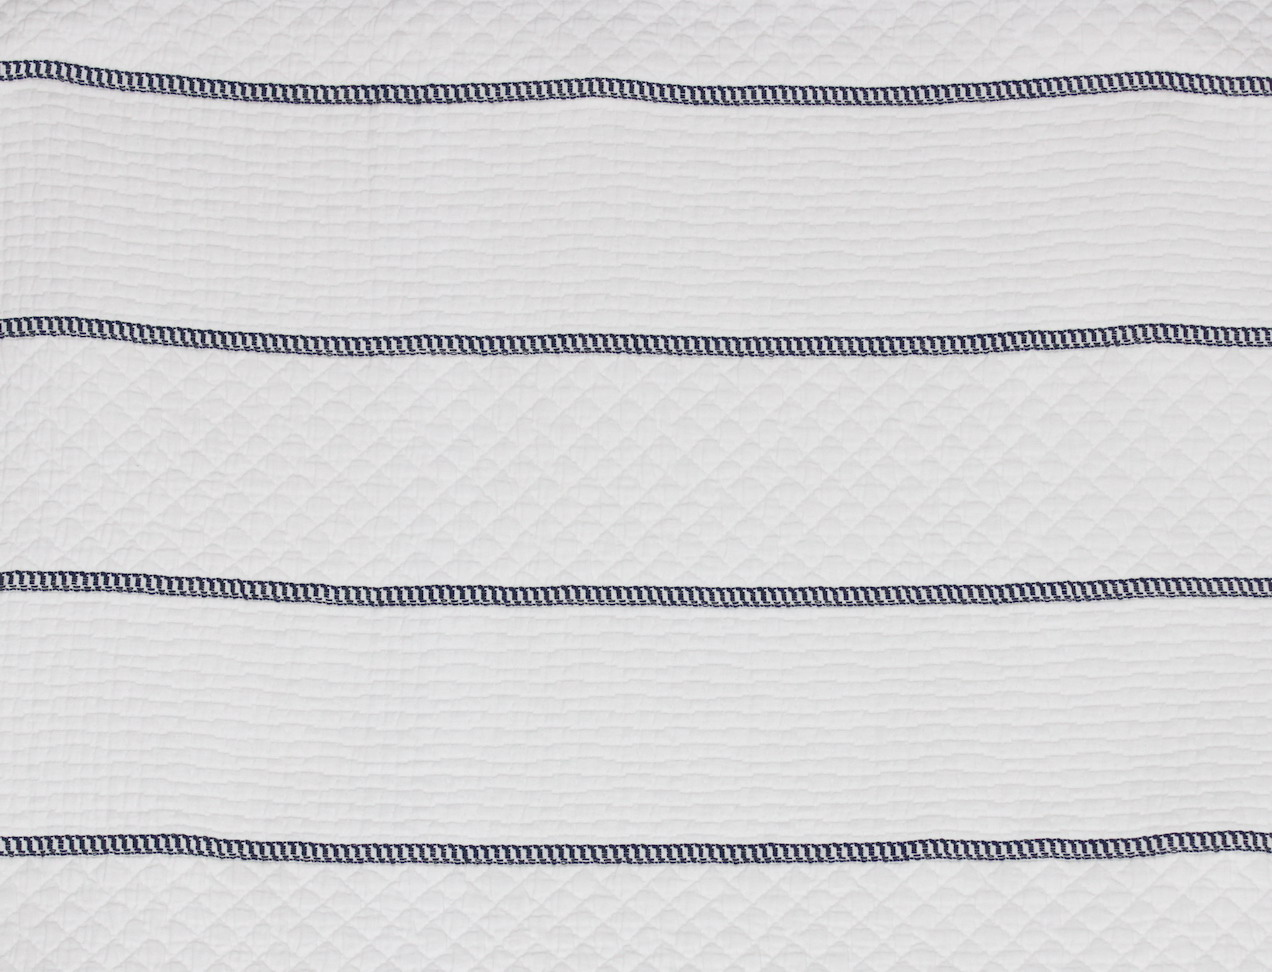 CAPRI BARRE' White Navy Blue Stripe